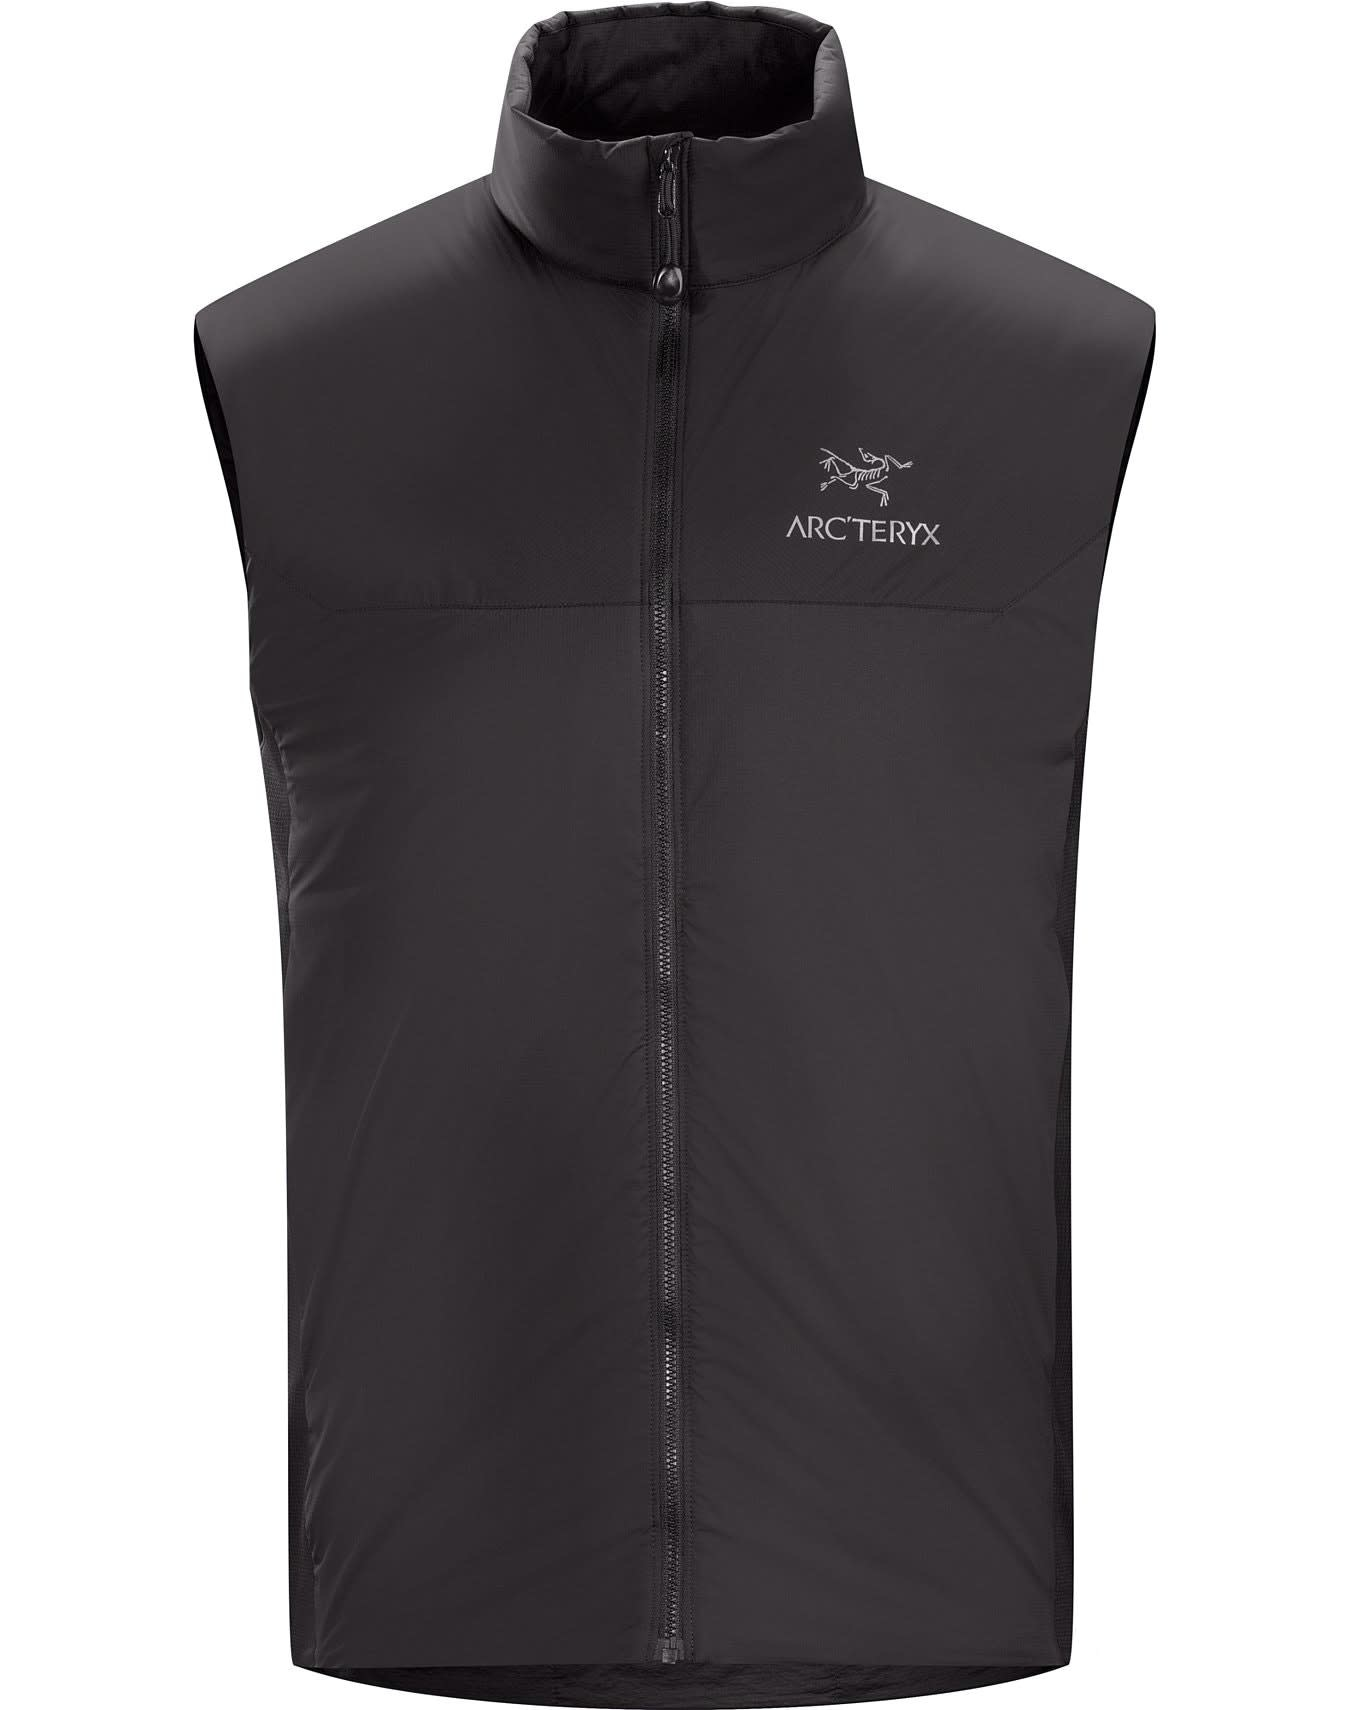 ARCTERYX Arc'teryx M's Atom LT Vest